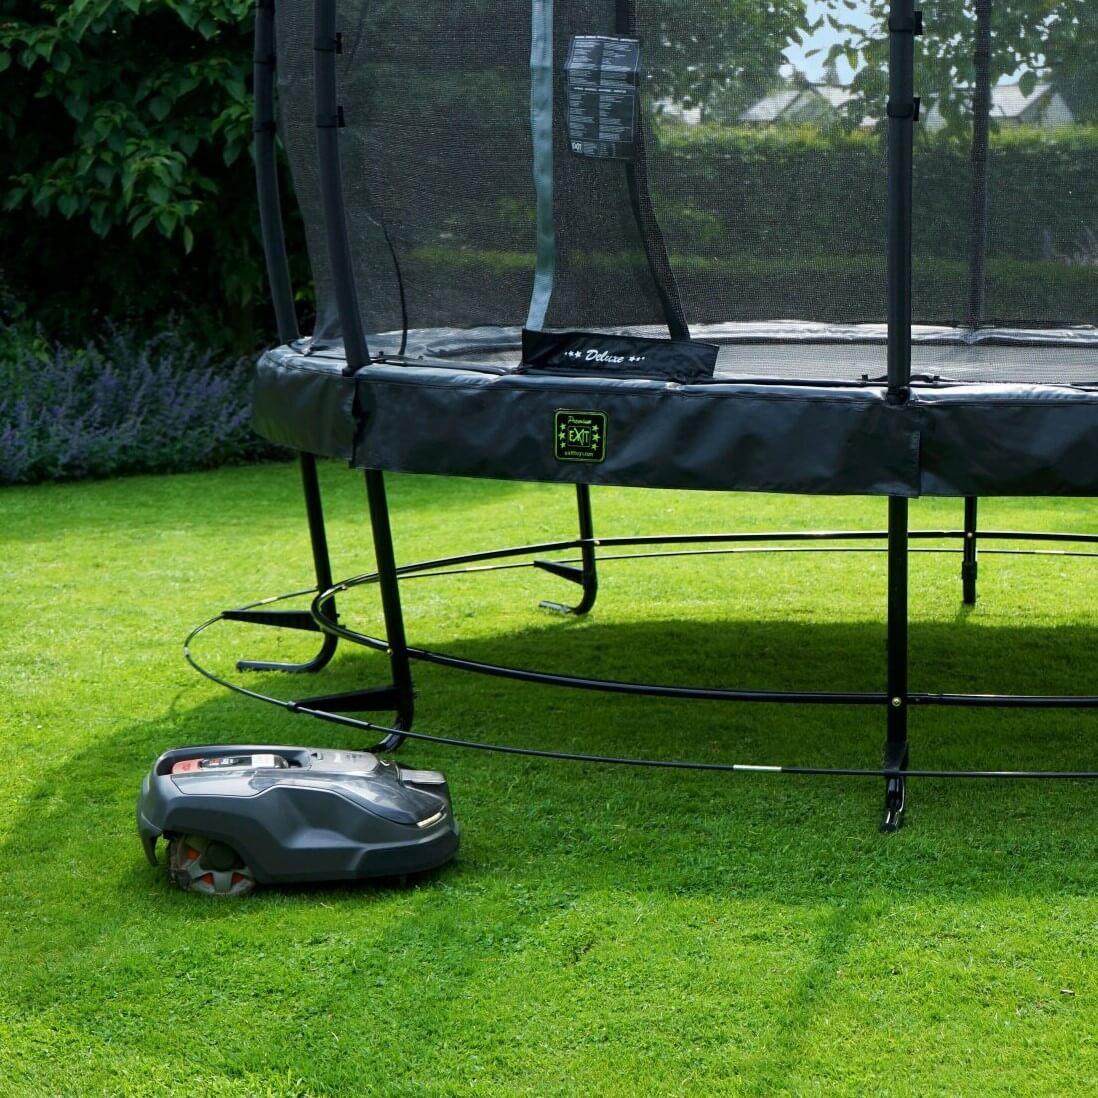 EXIT Mähroboter Stopp - trampolin-profi.de